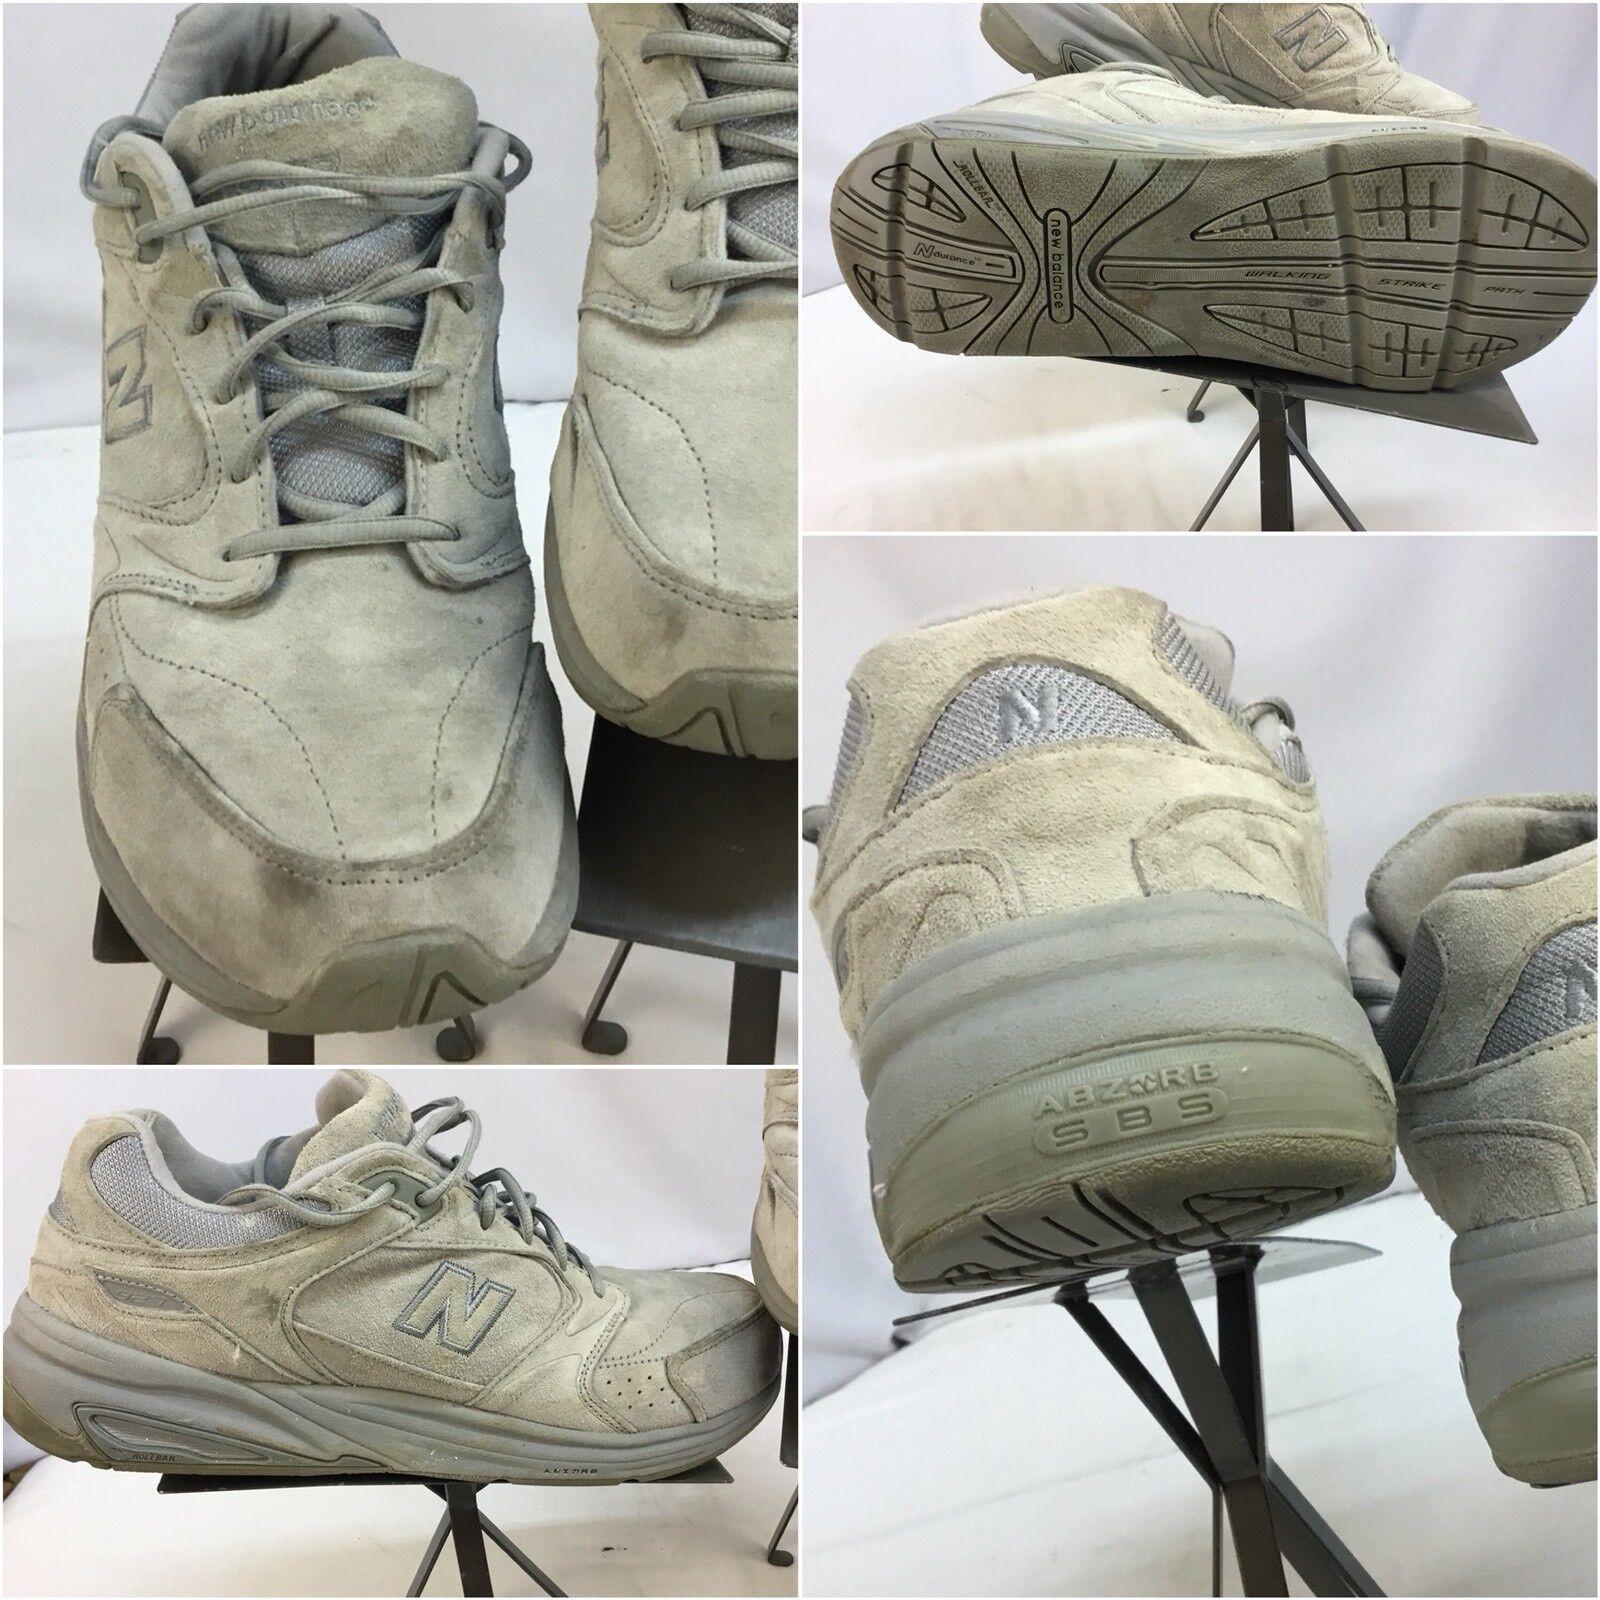 New blance 927 sz 12,5 g scarpe di pelle grigia scarpe g comode euc ygi a8 f6b890